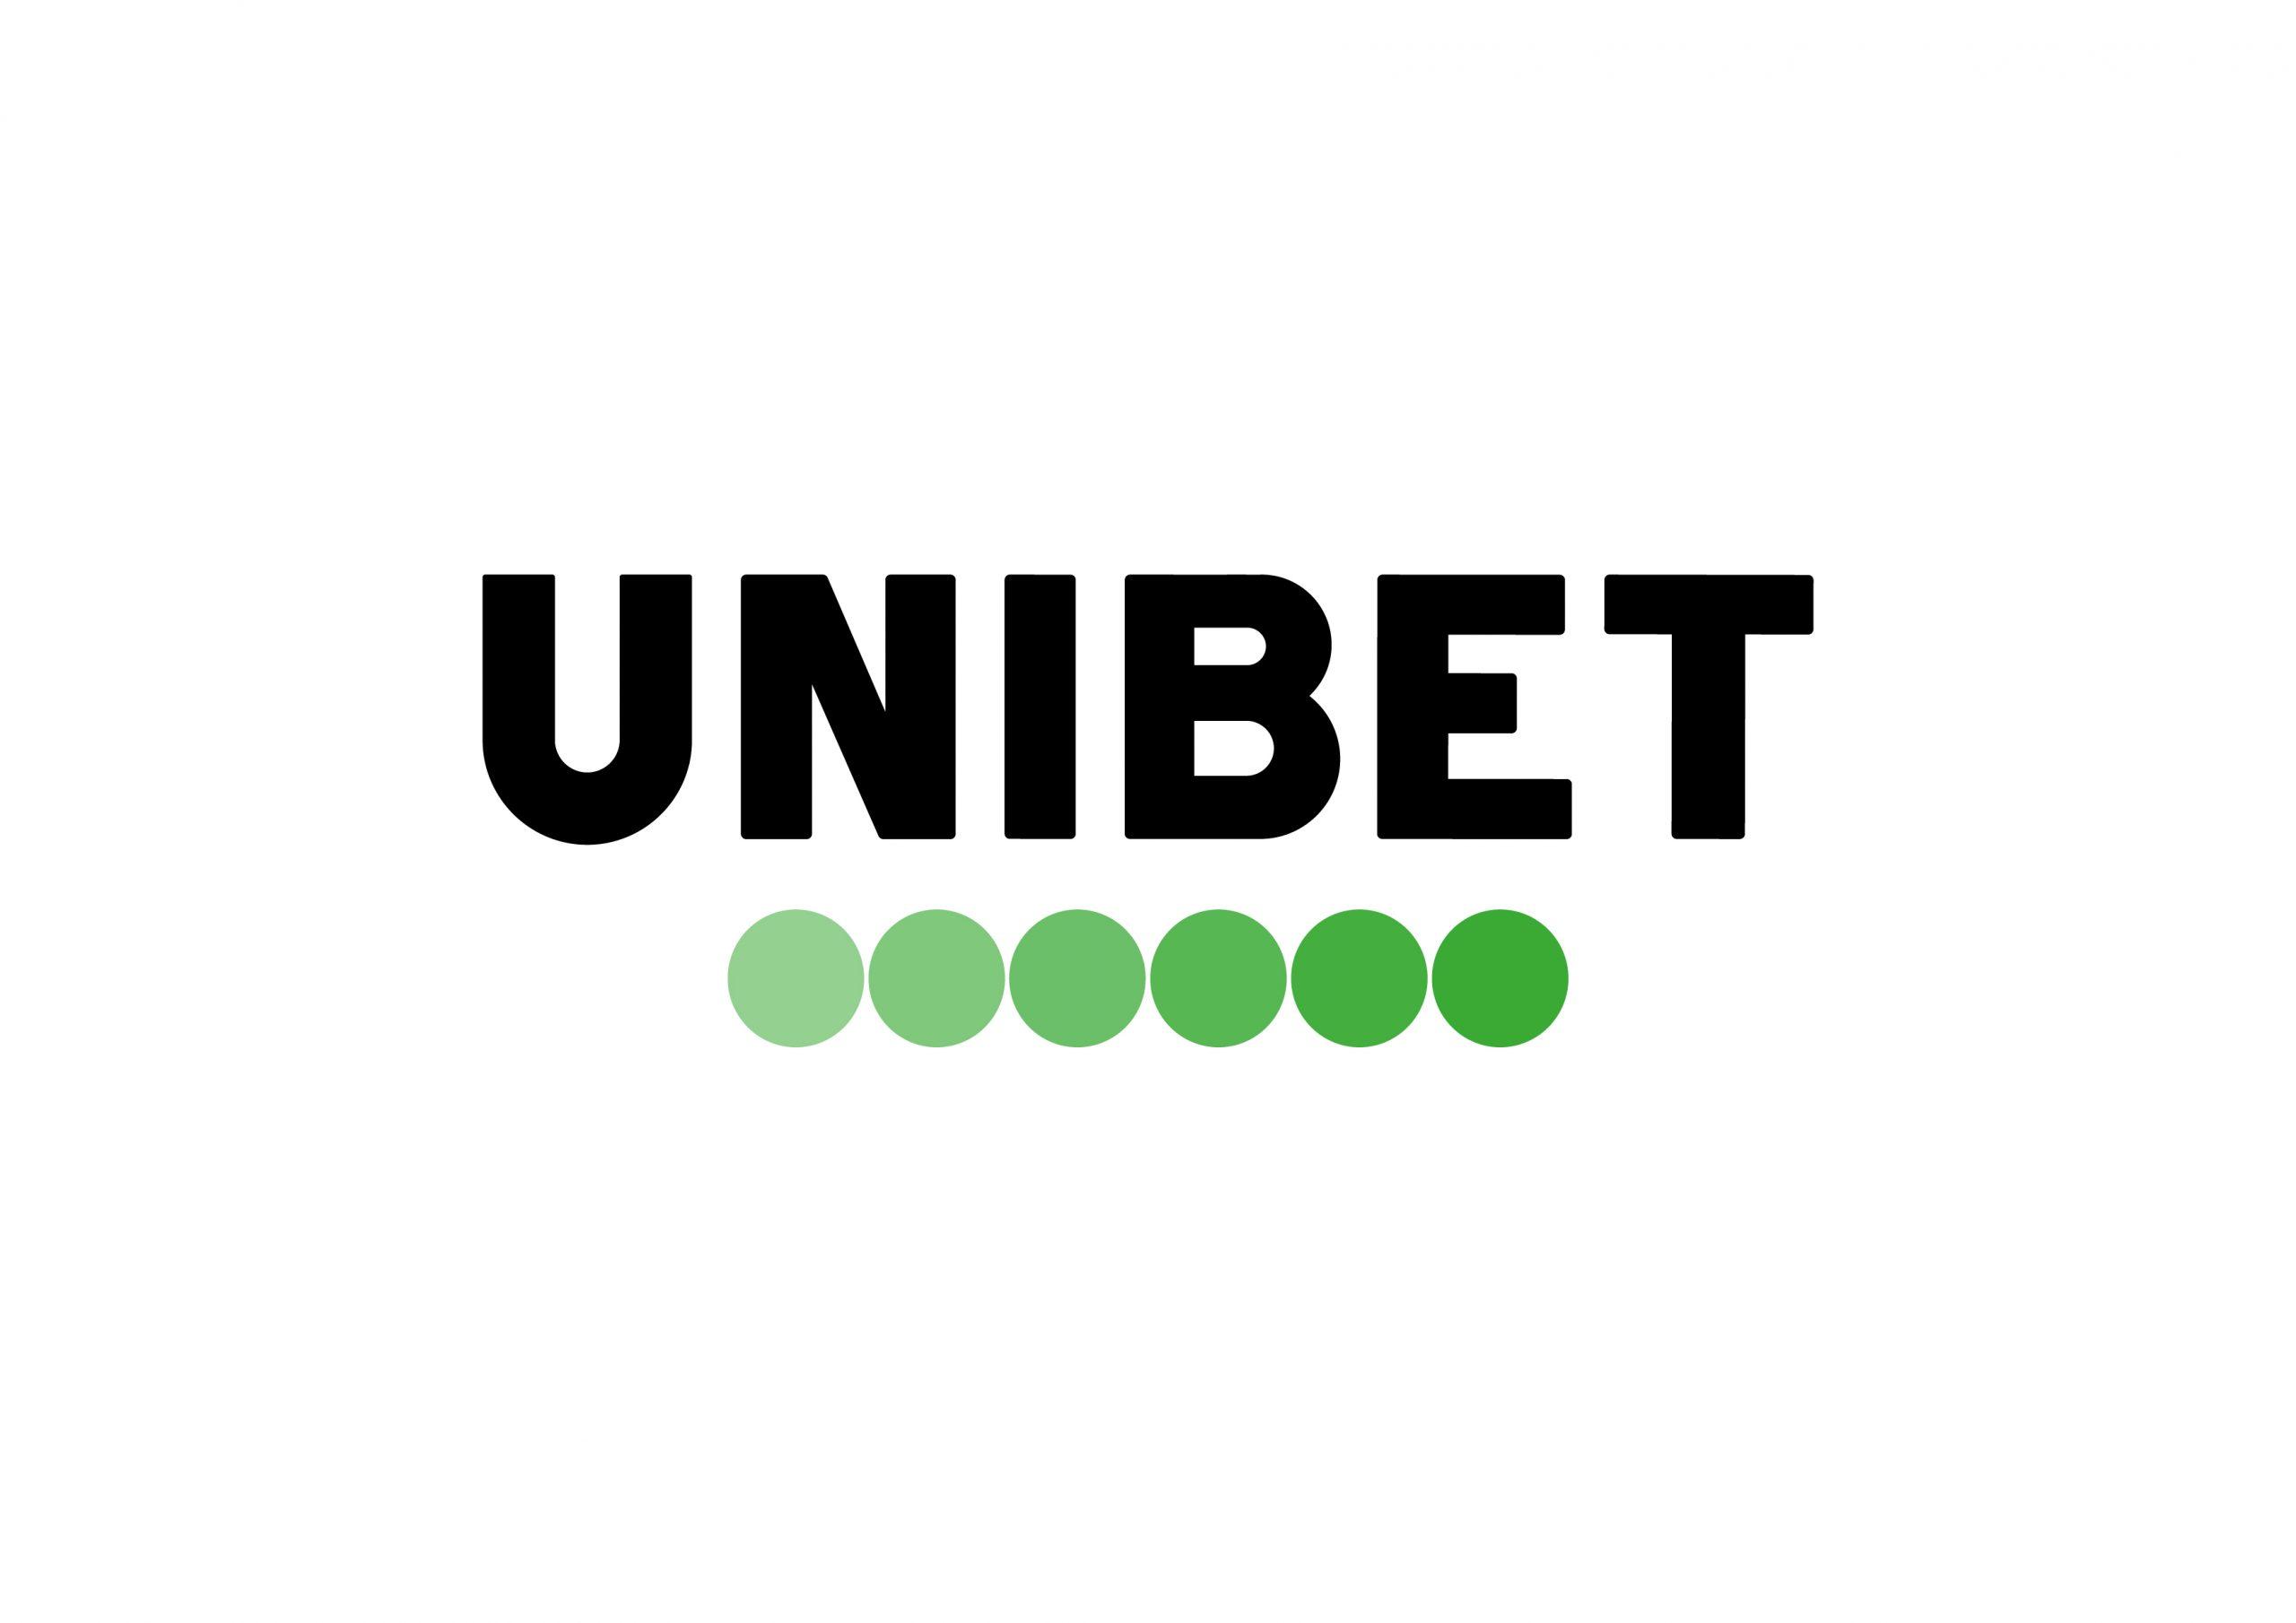 Unibet Sportsbook Review